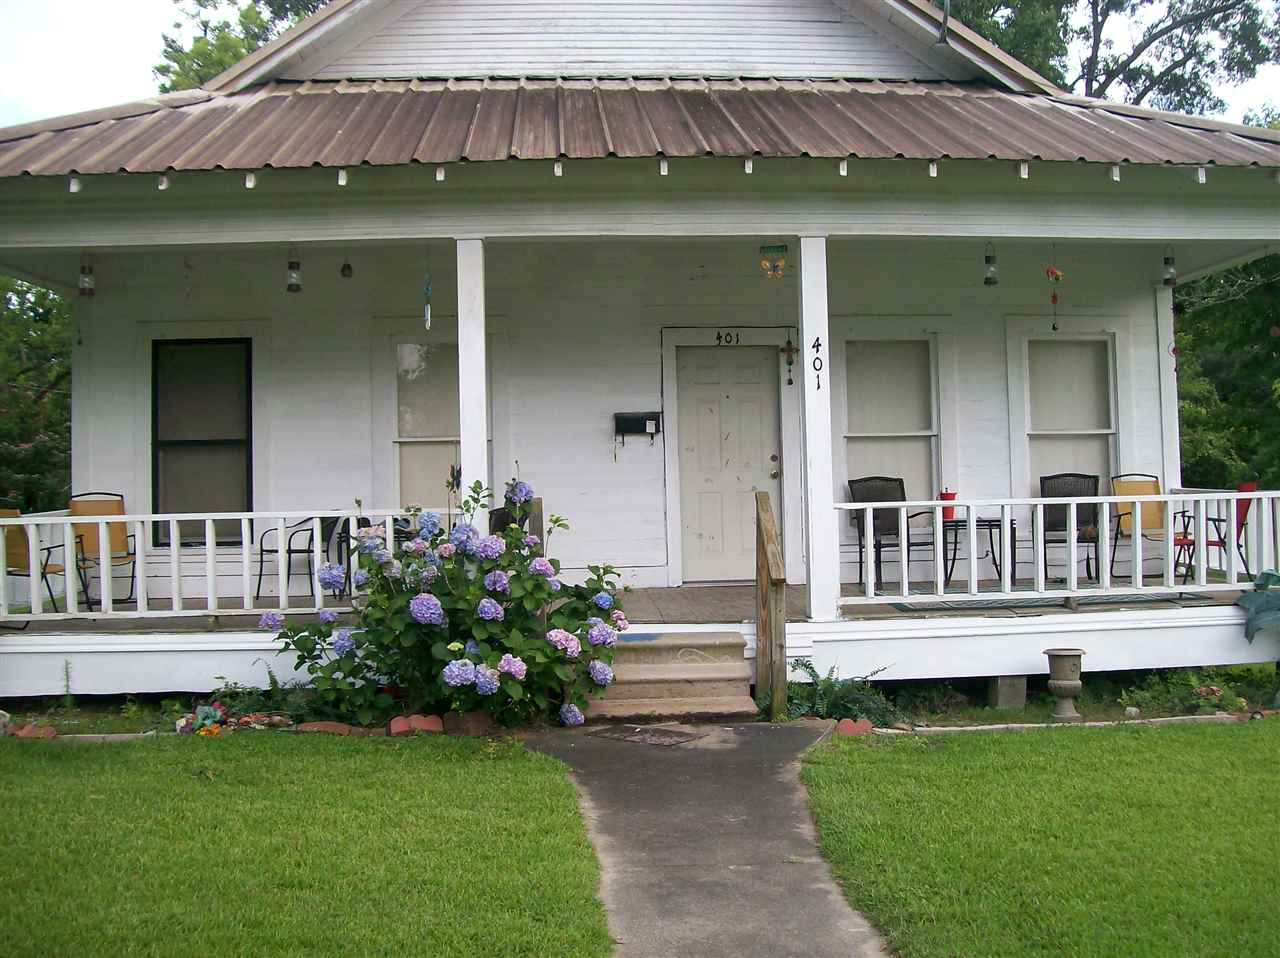 401 W Main, Kirbyville, TX 75956